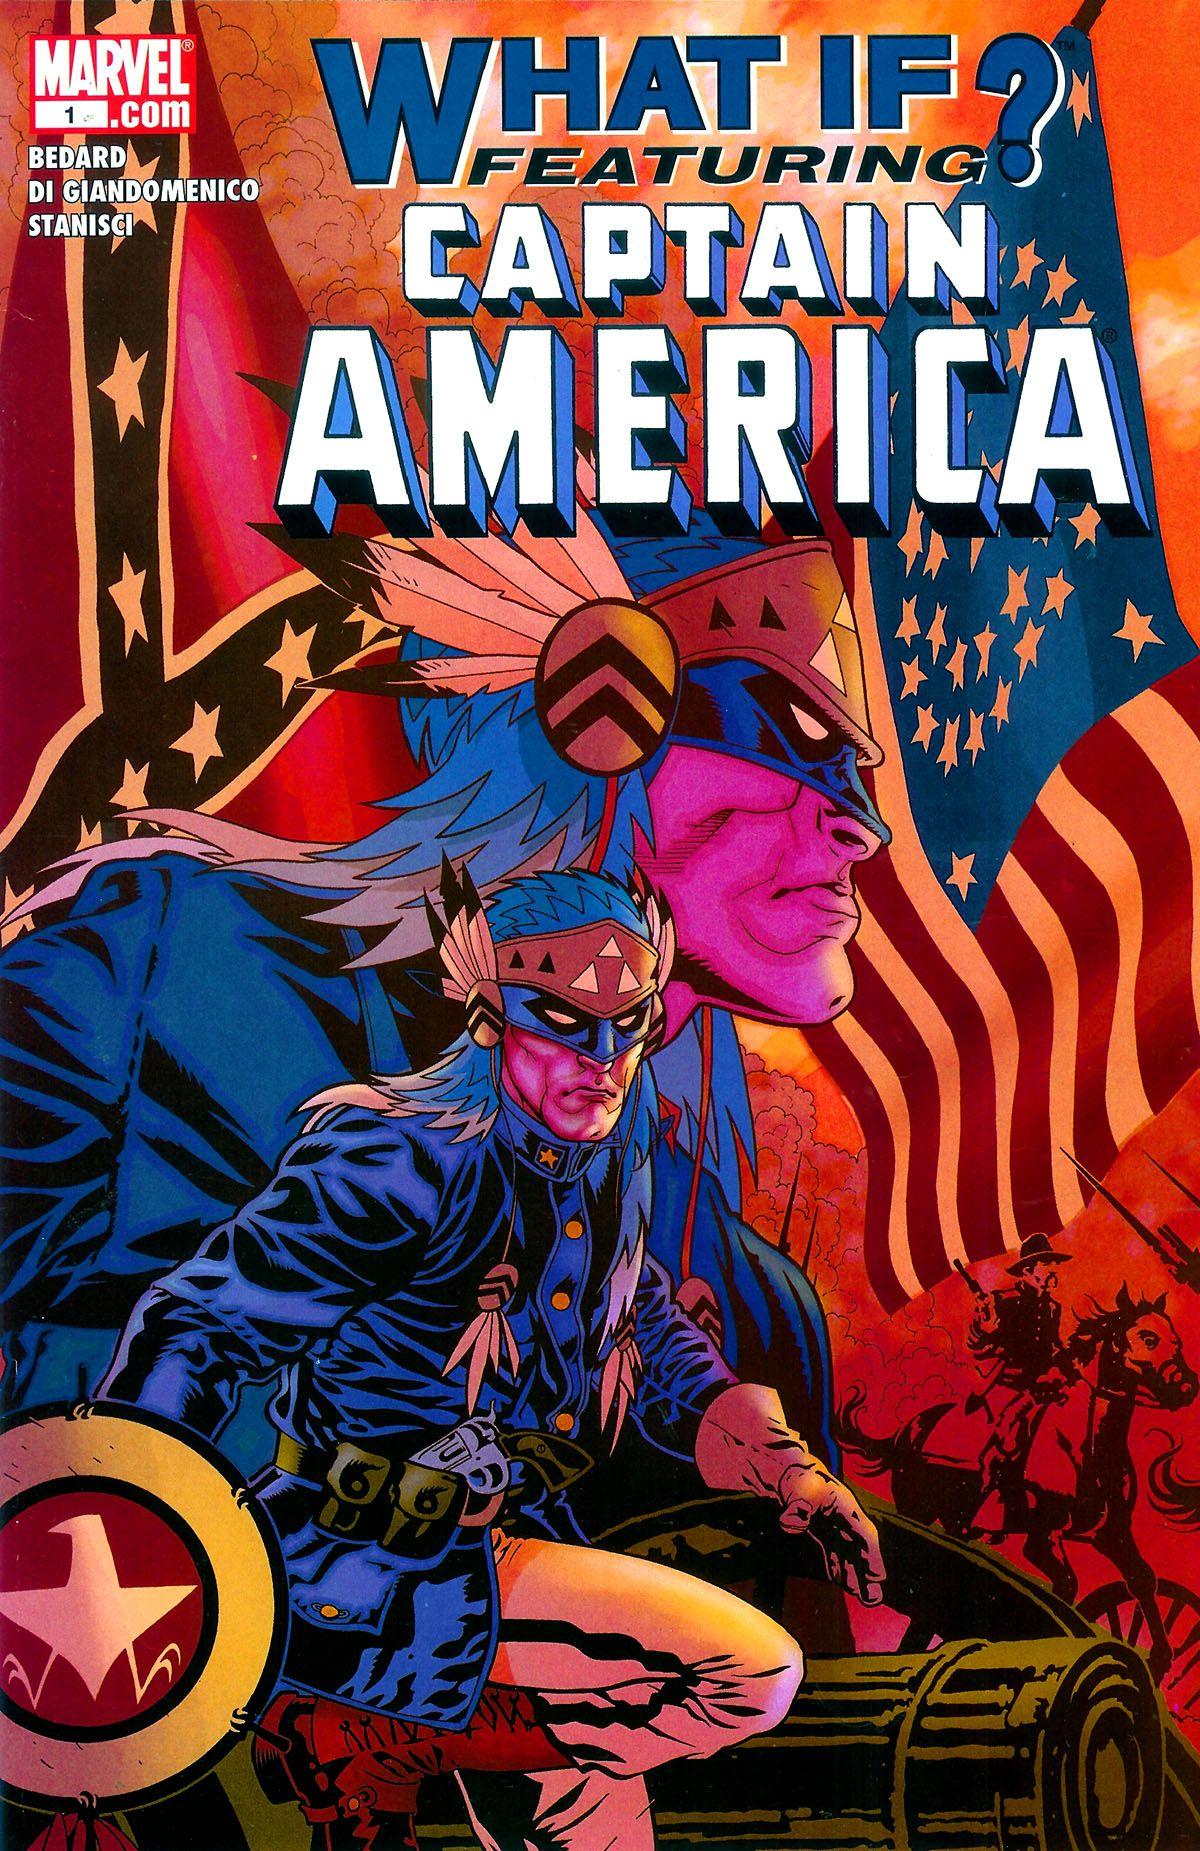 ArtStation - Captain America Cover, Admira Wijaya